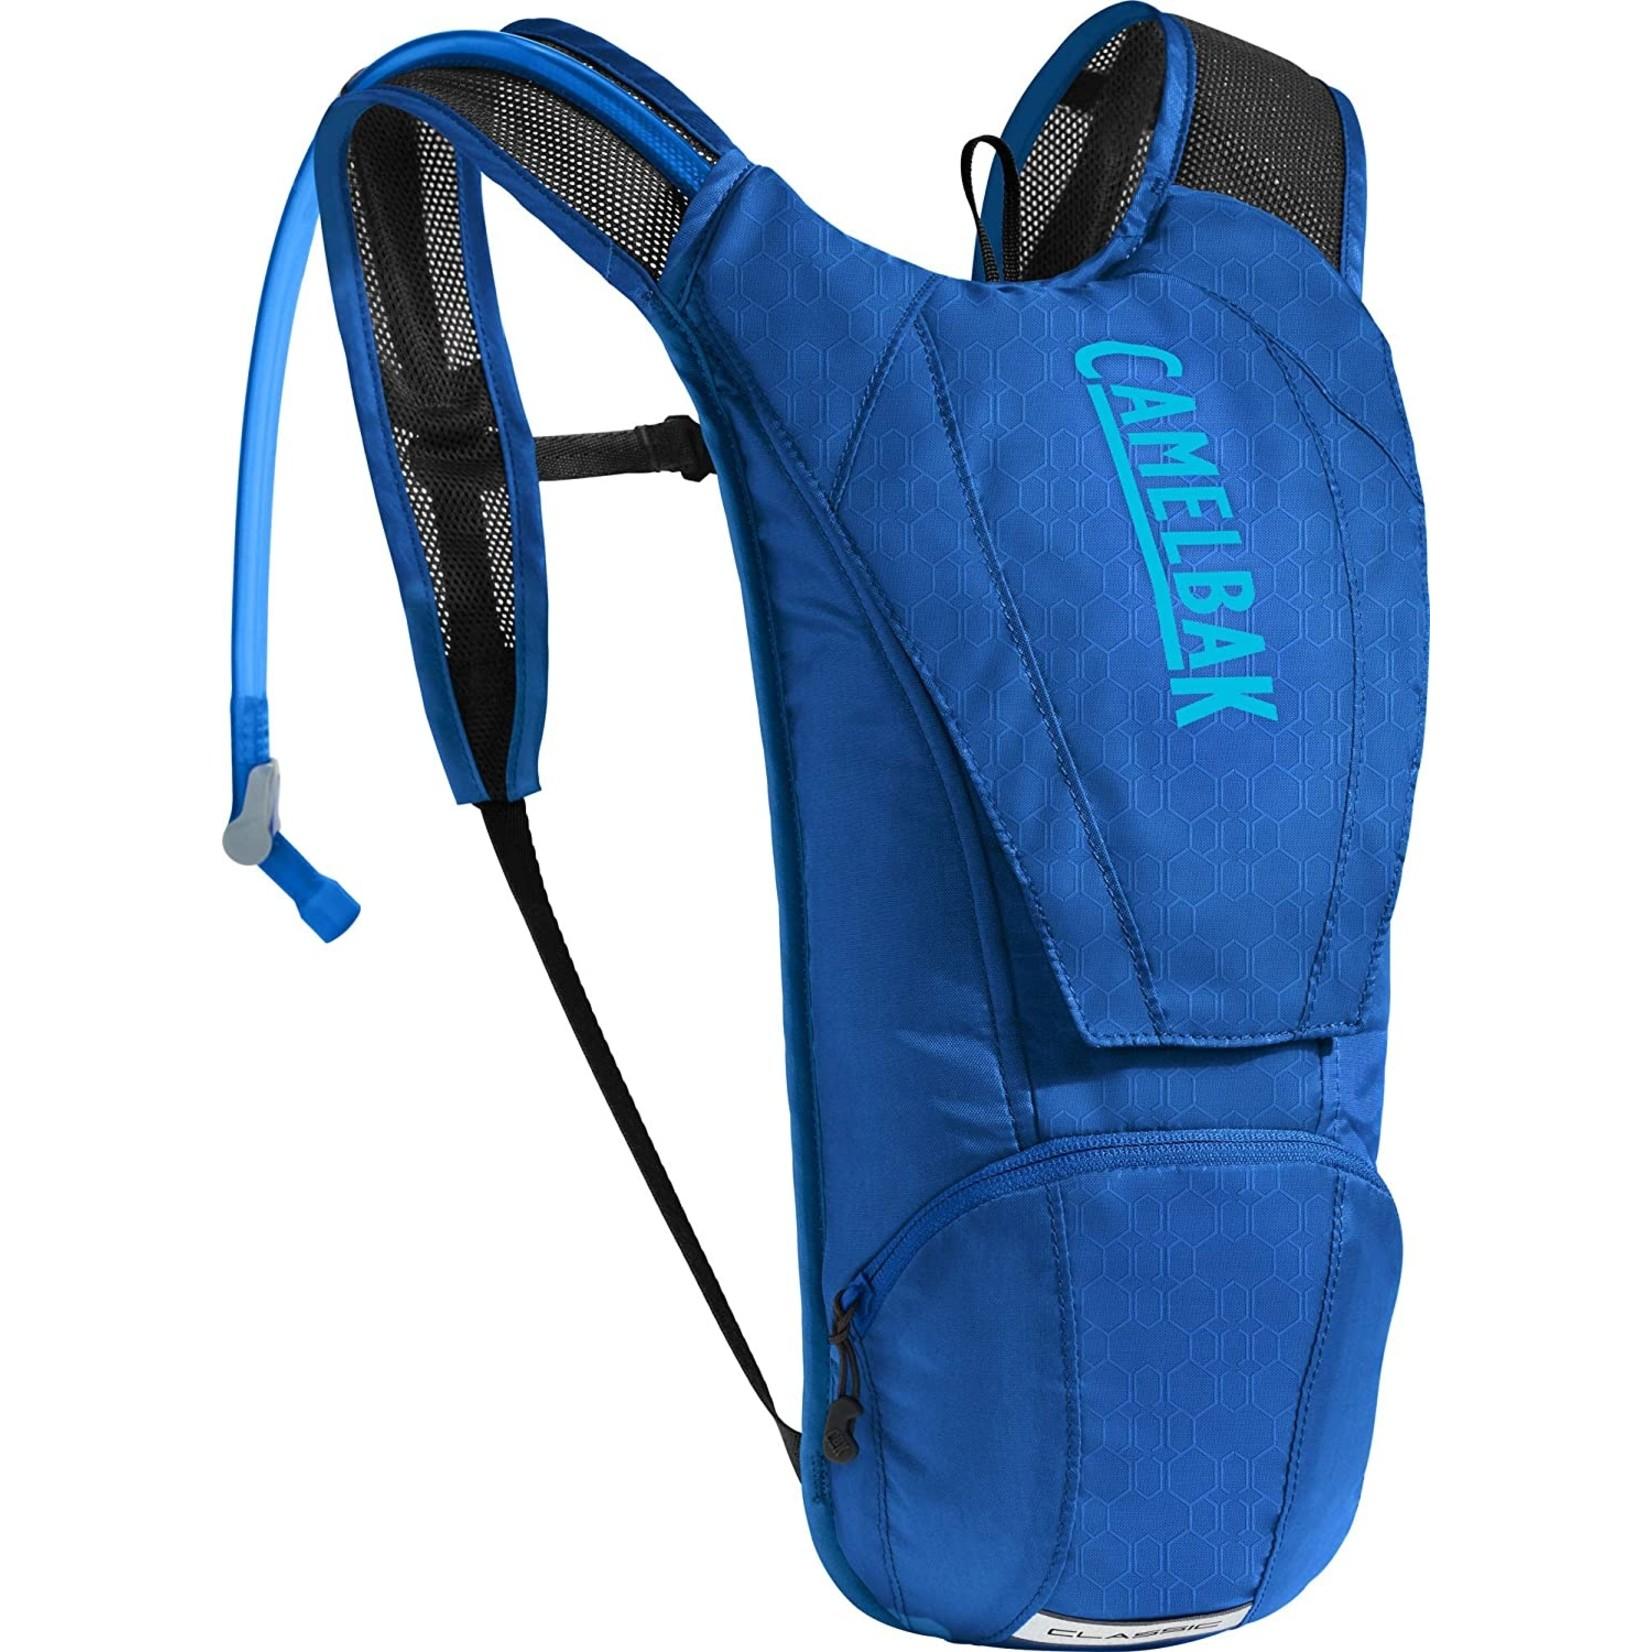 Camelbak Lapis Blue-Atomic Blue Classic - 2.5 Litre Hydration Pack with Reservoir